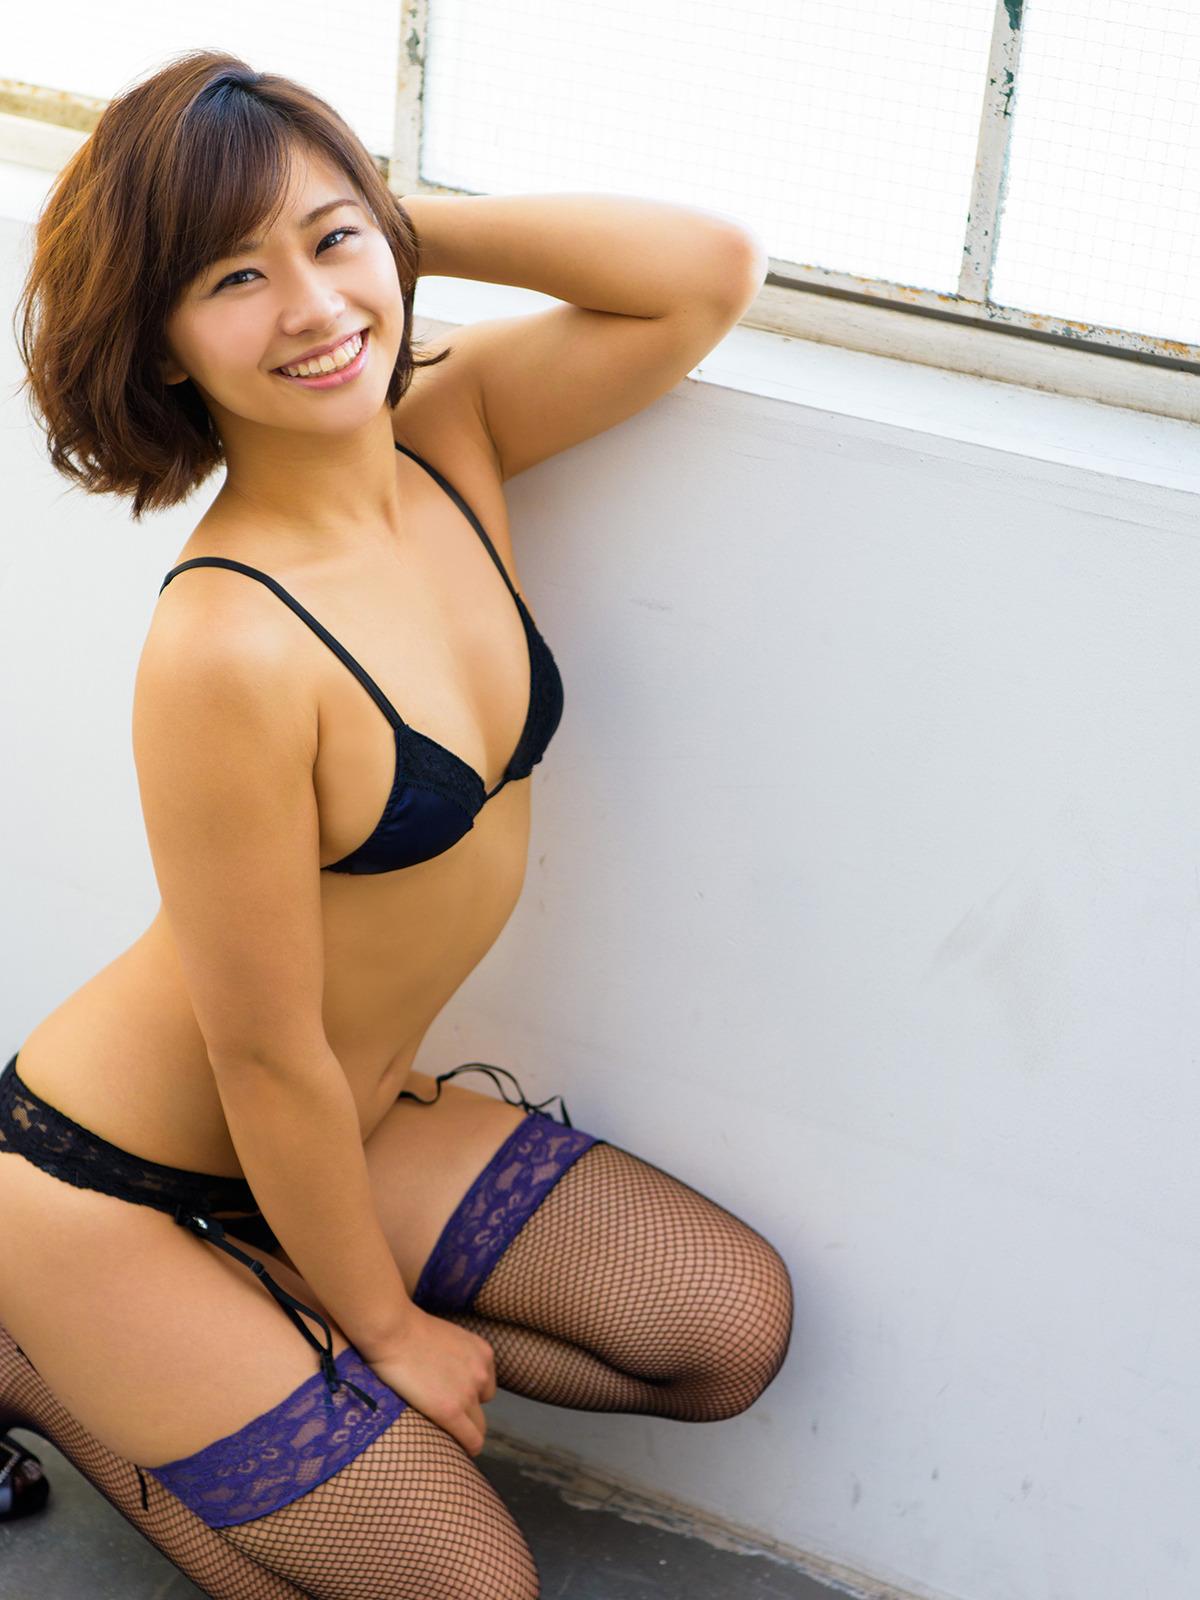 Asian Scanlover 17